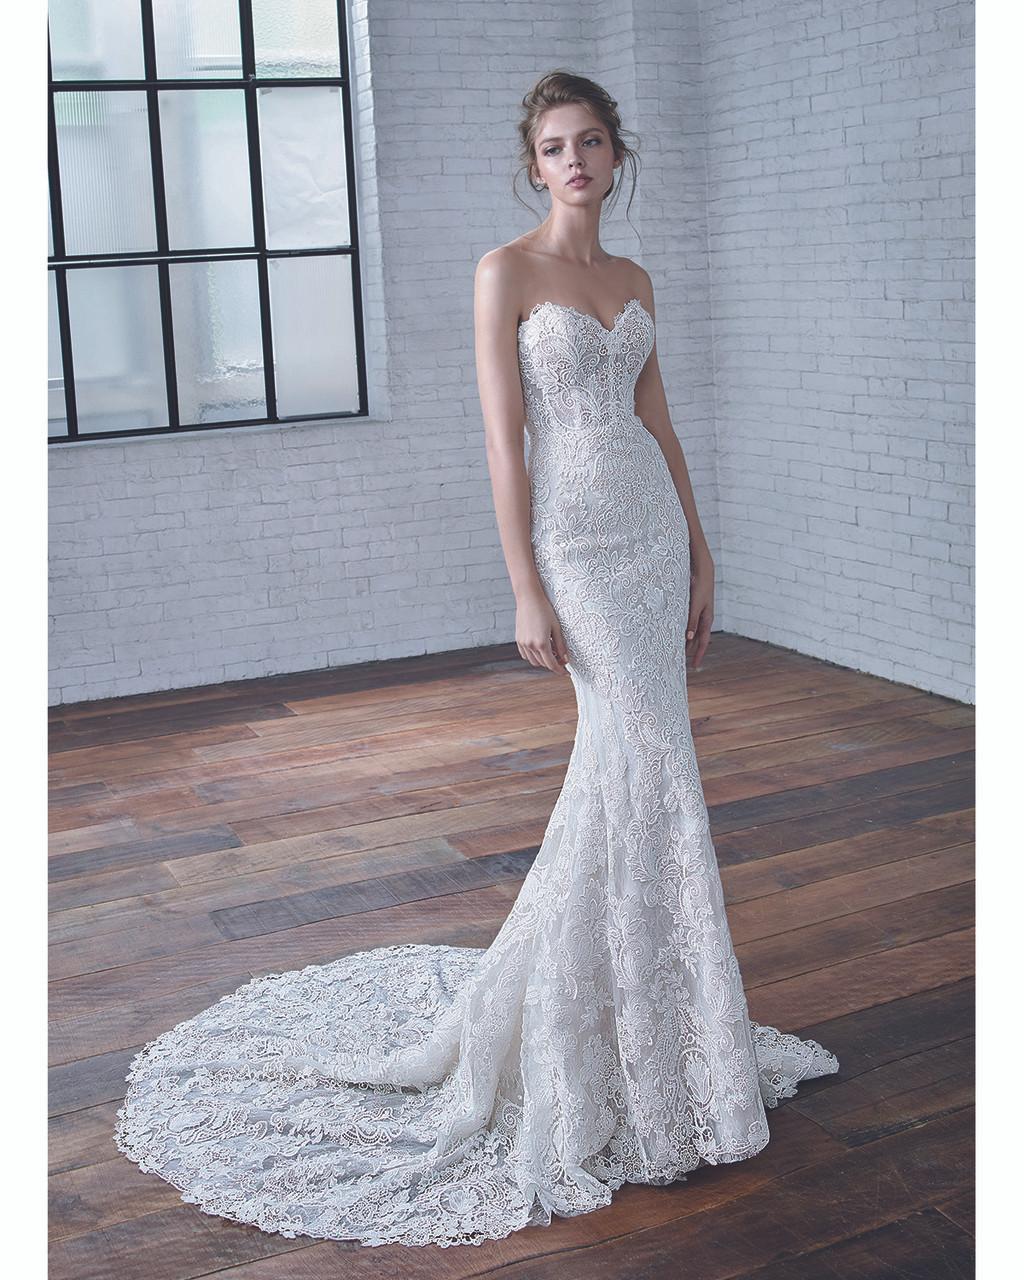 22962d4a10b7 Ivory/Sand Celine Bridal Gown